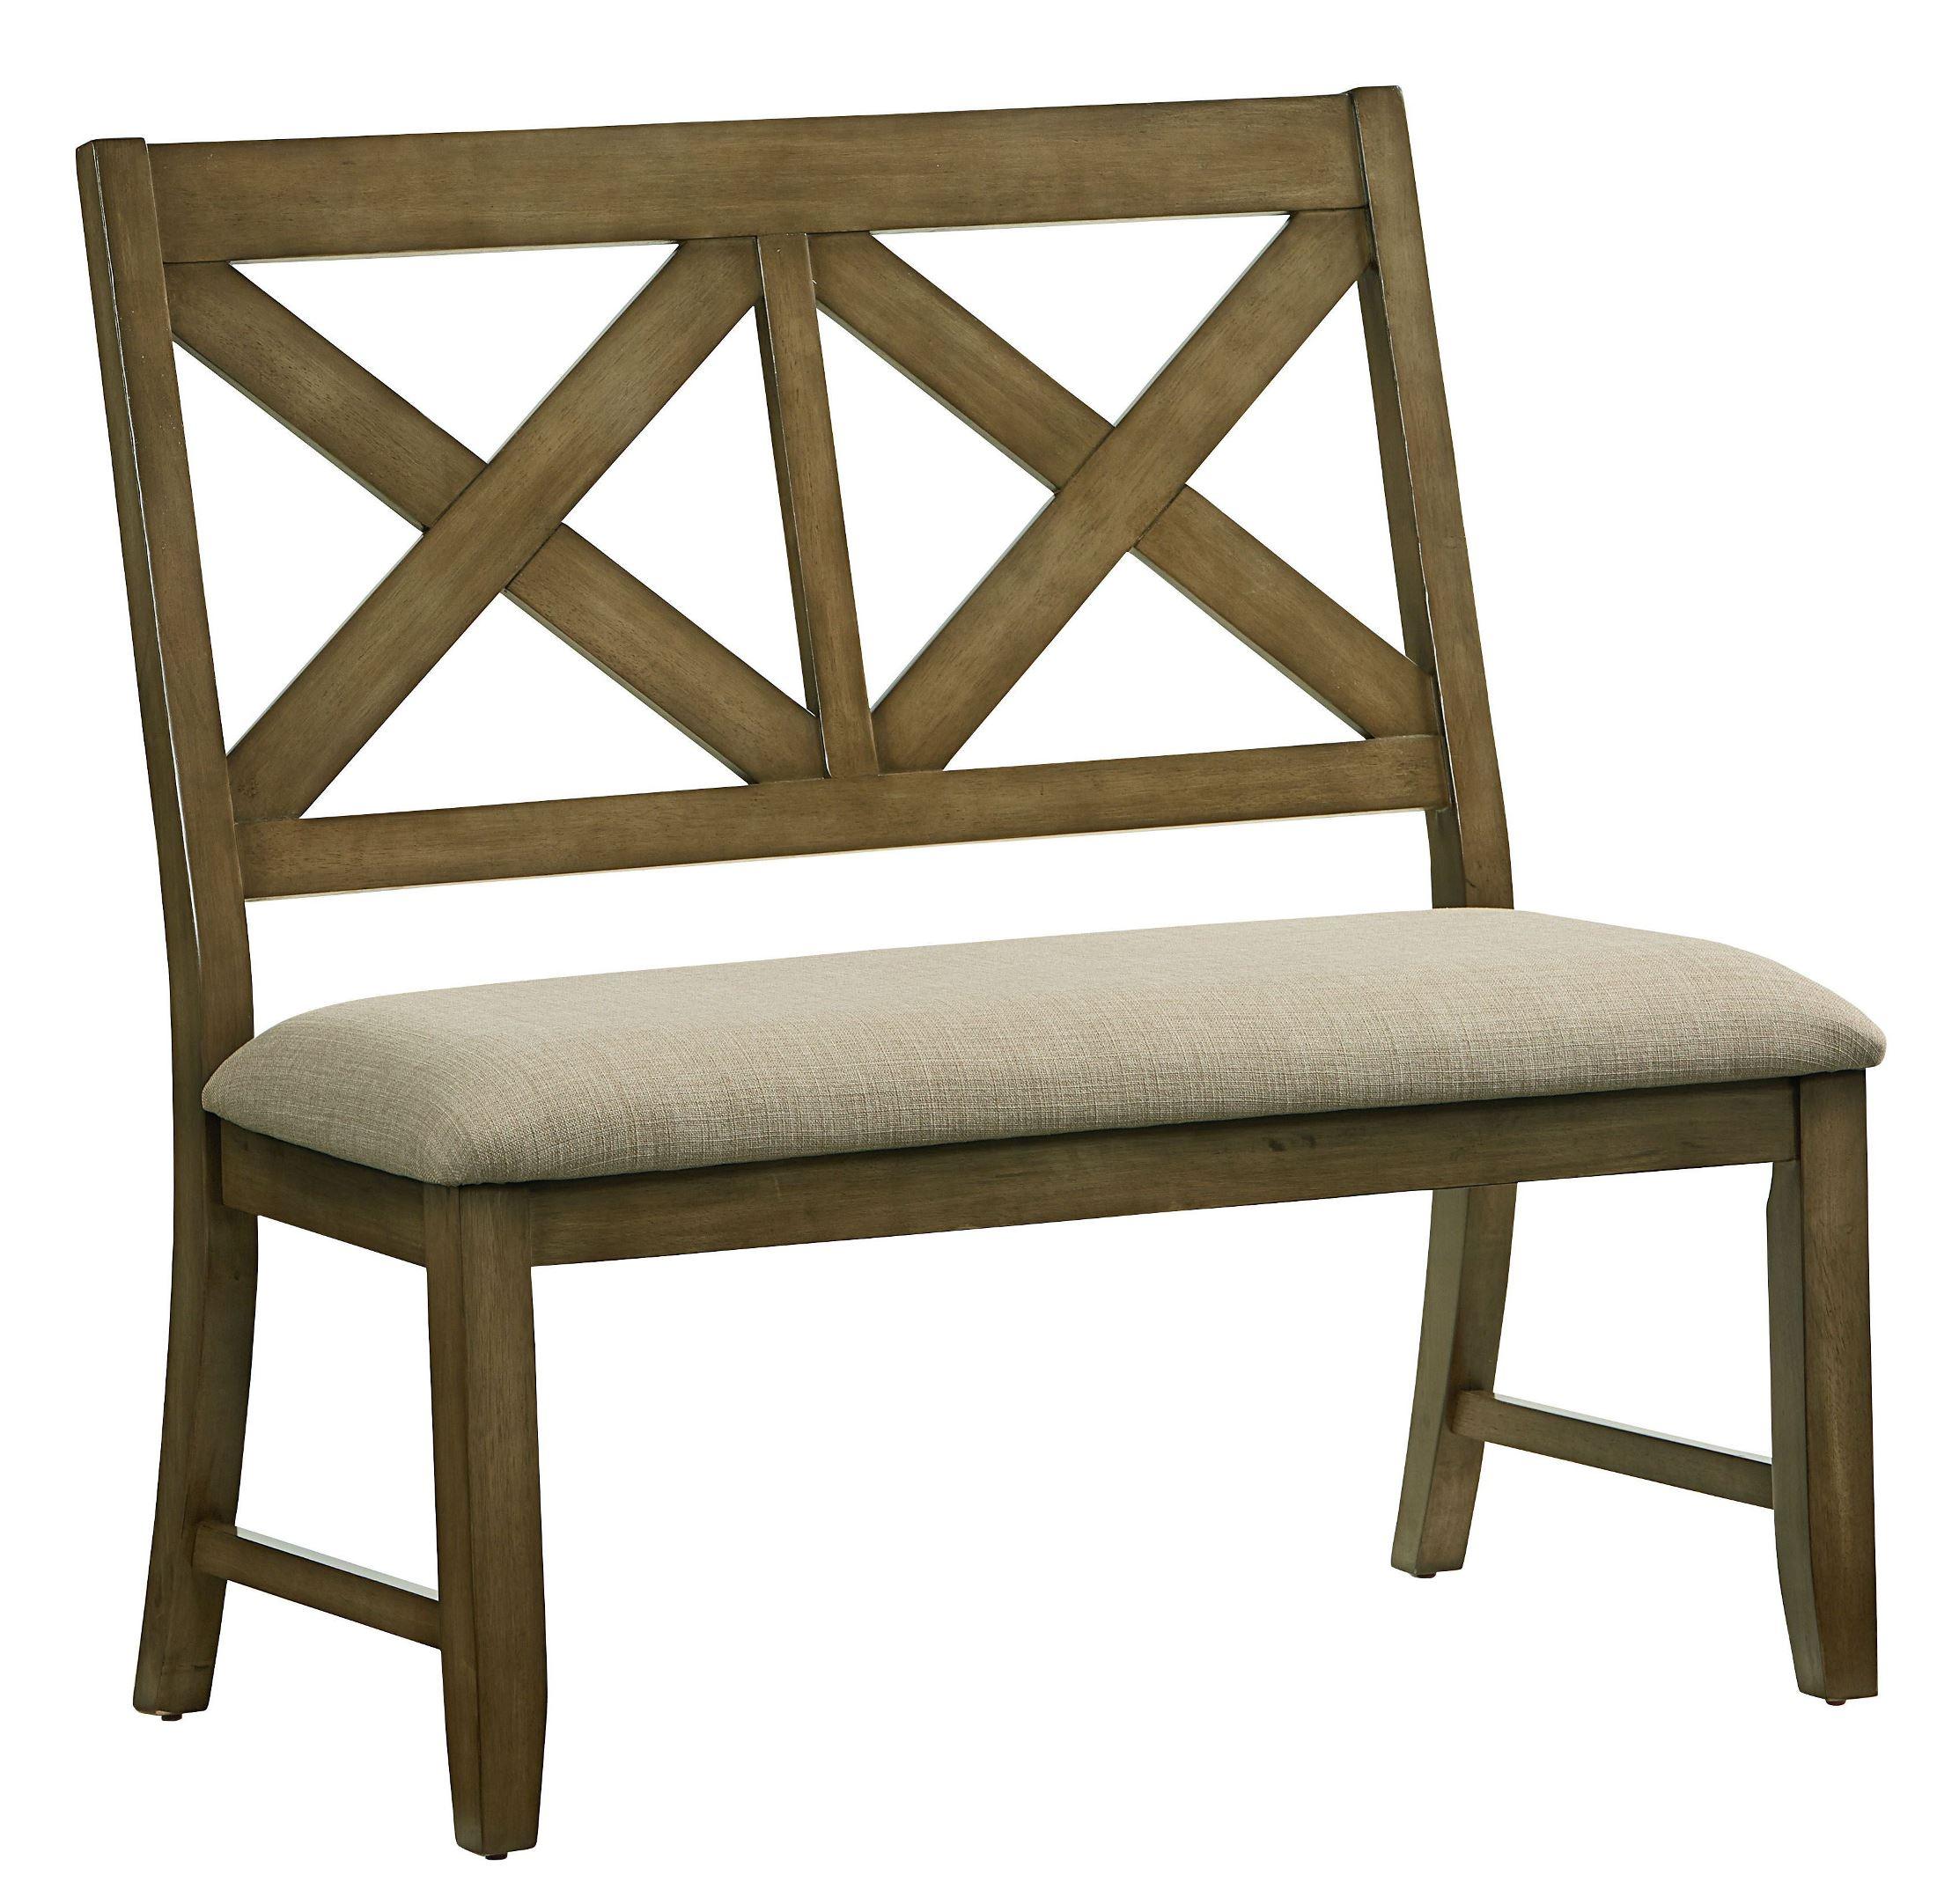 Outdoor Patio Furniture Omaha Ne: Standard Furniture Omaha Weathered Burnished Grey X-Back